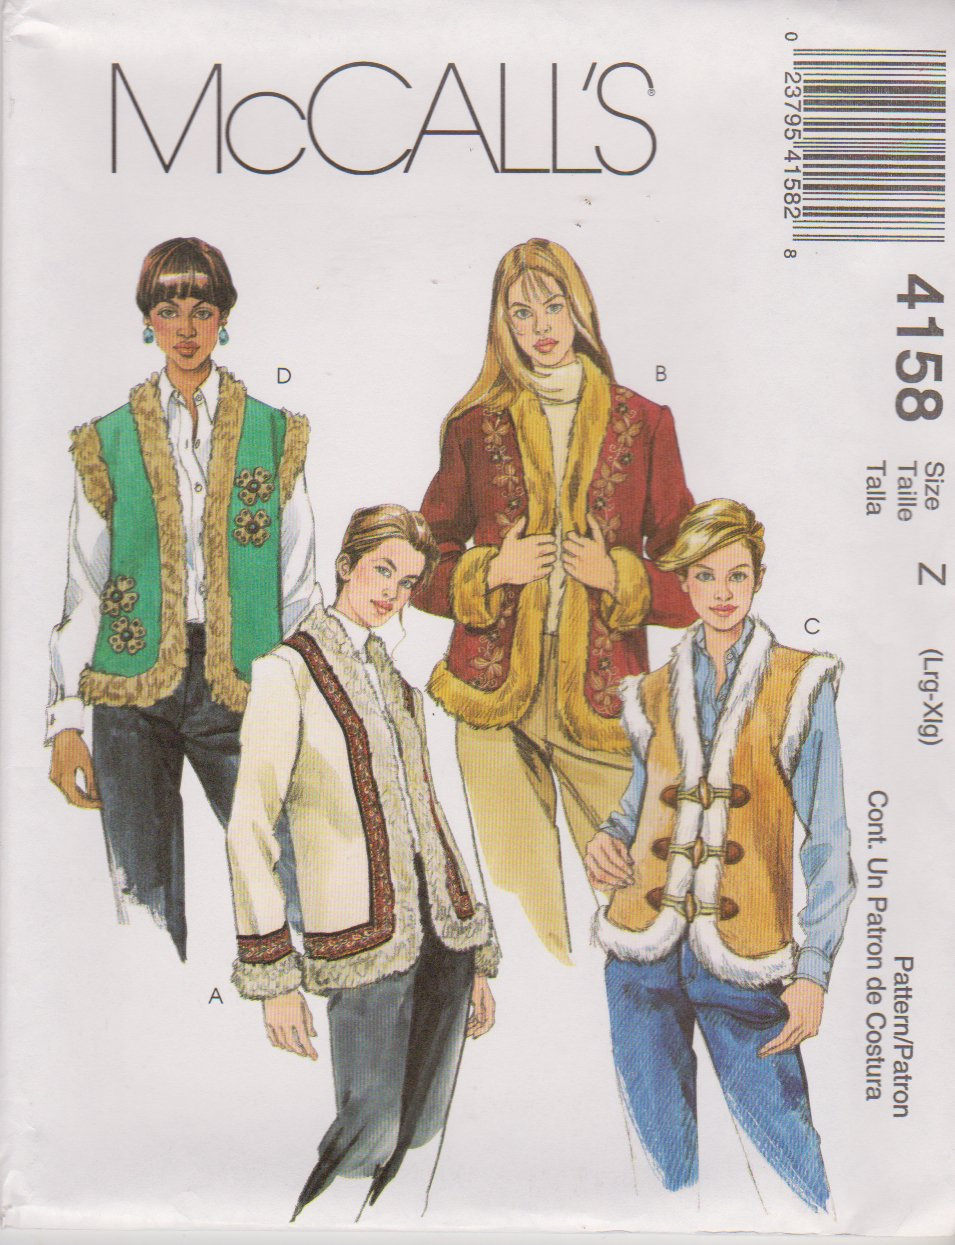 McCall's Sewing Pattern 4158 M4158 Misses Size 16-22 Lined Fur Trimmed Appliqued Vest Jackets